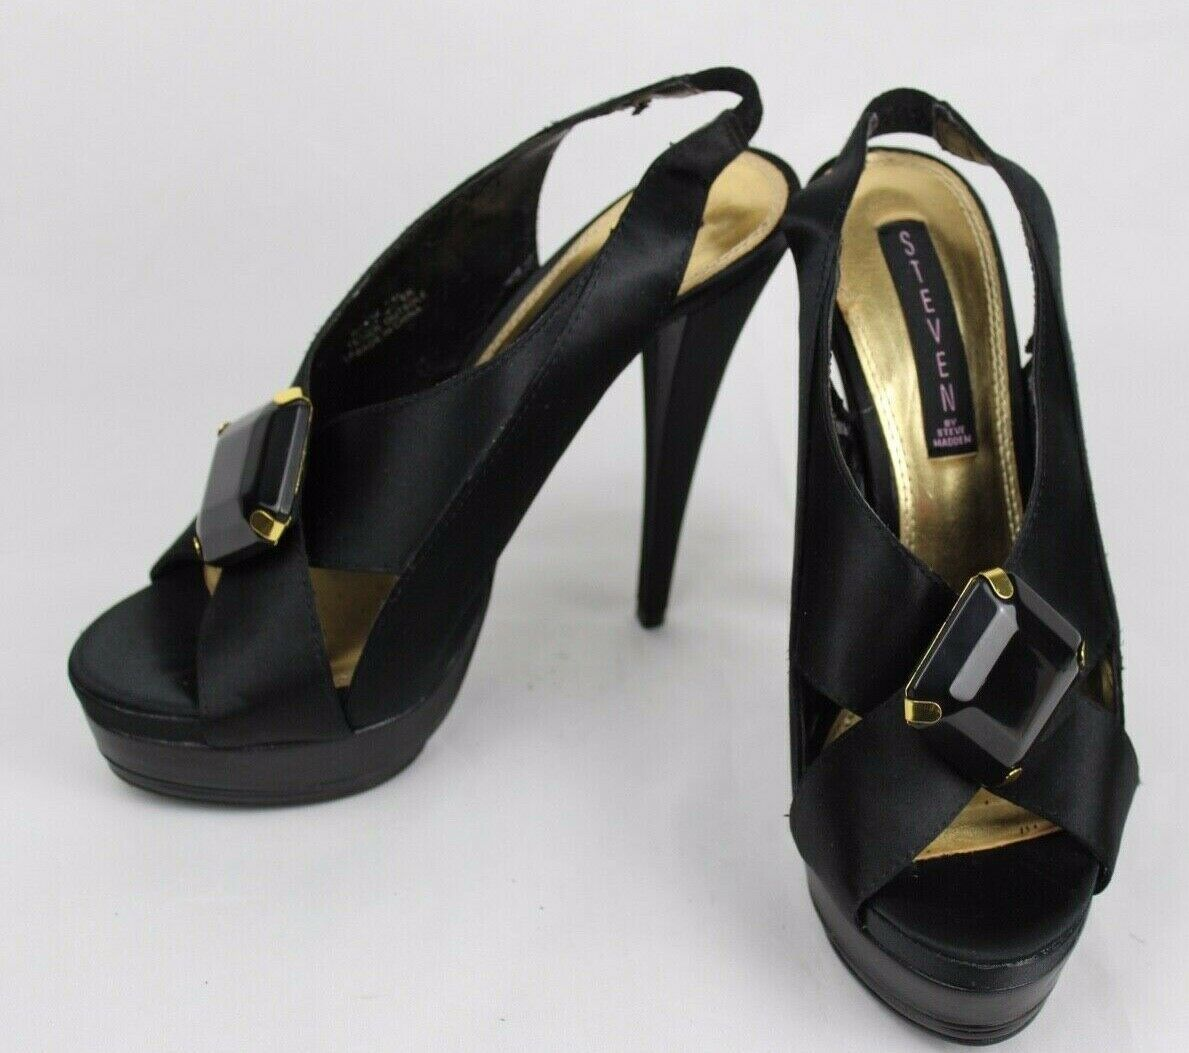 Steven By Steve Madden Rockz women's black satin sandals shoes size 7.5